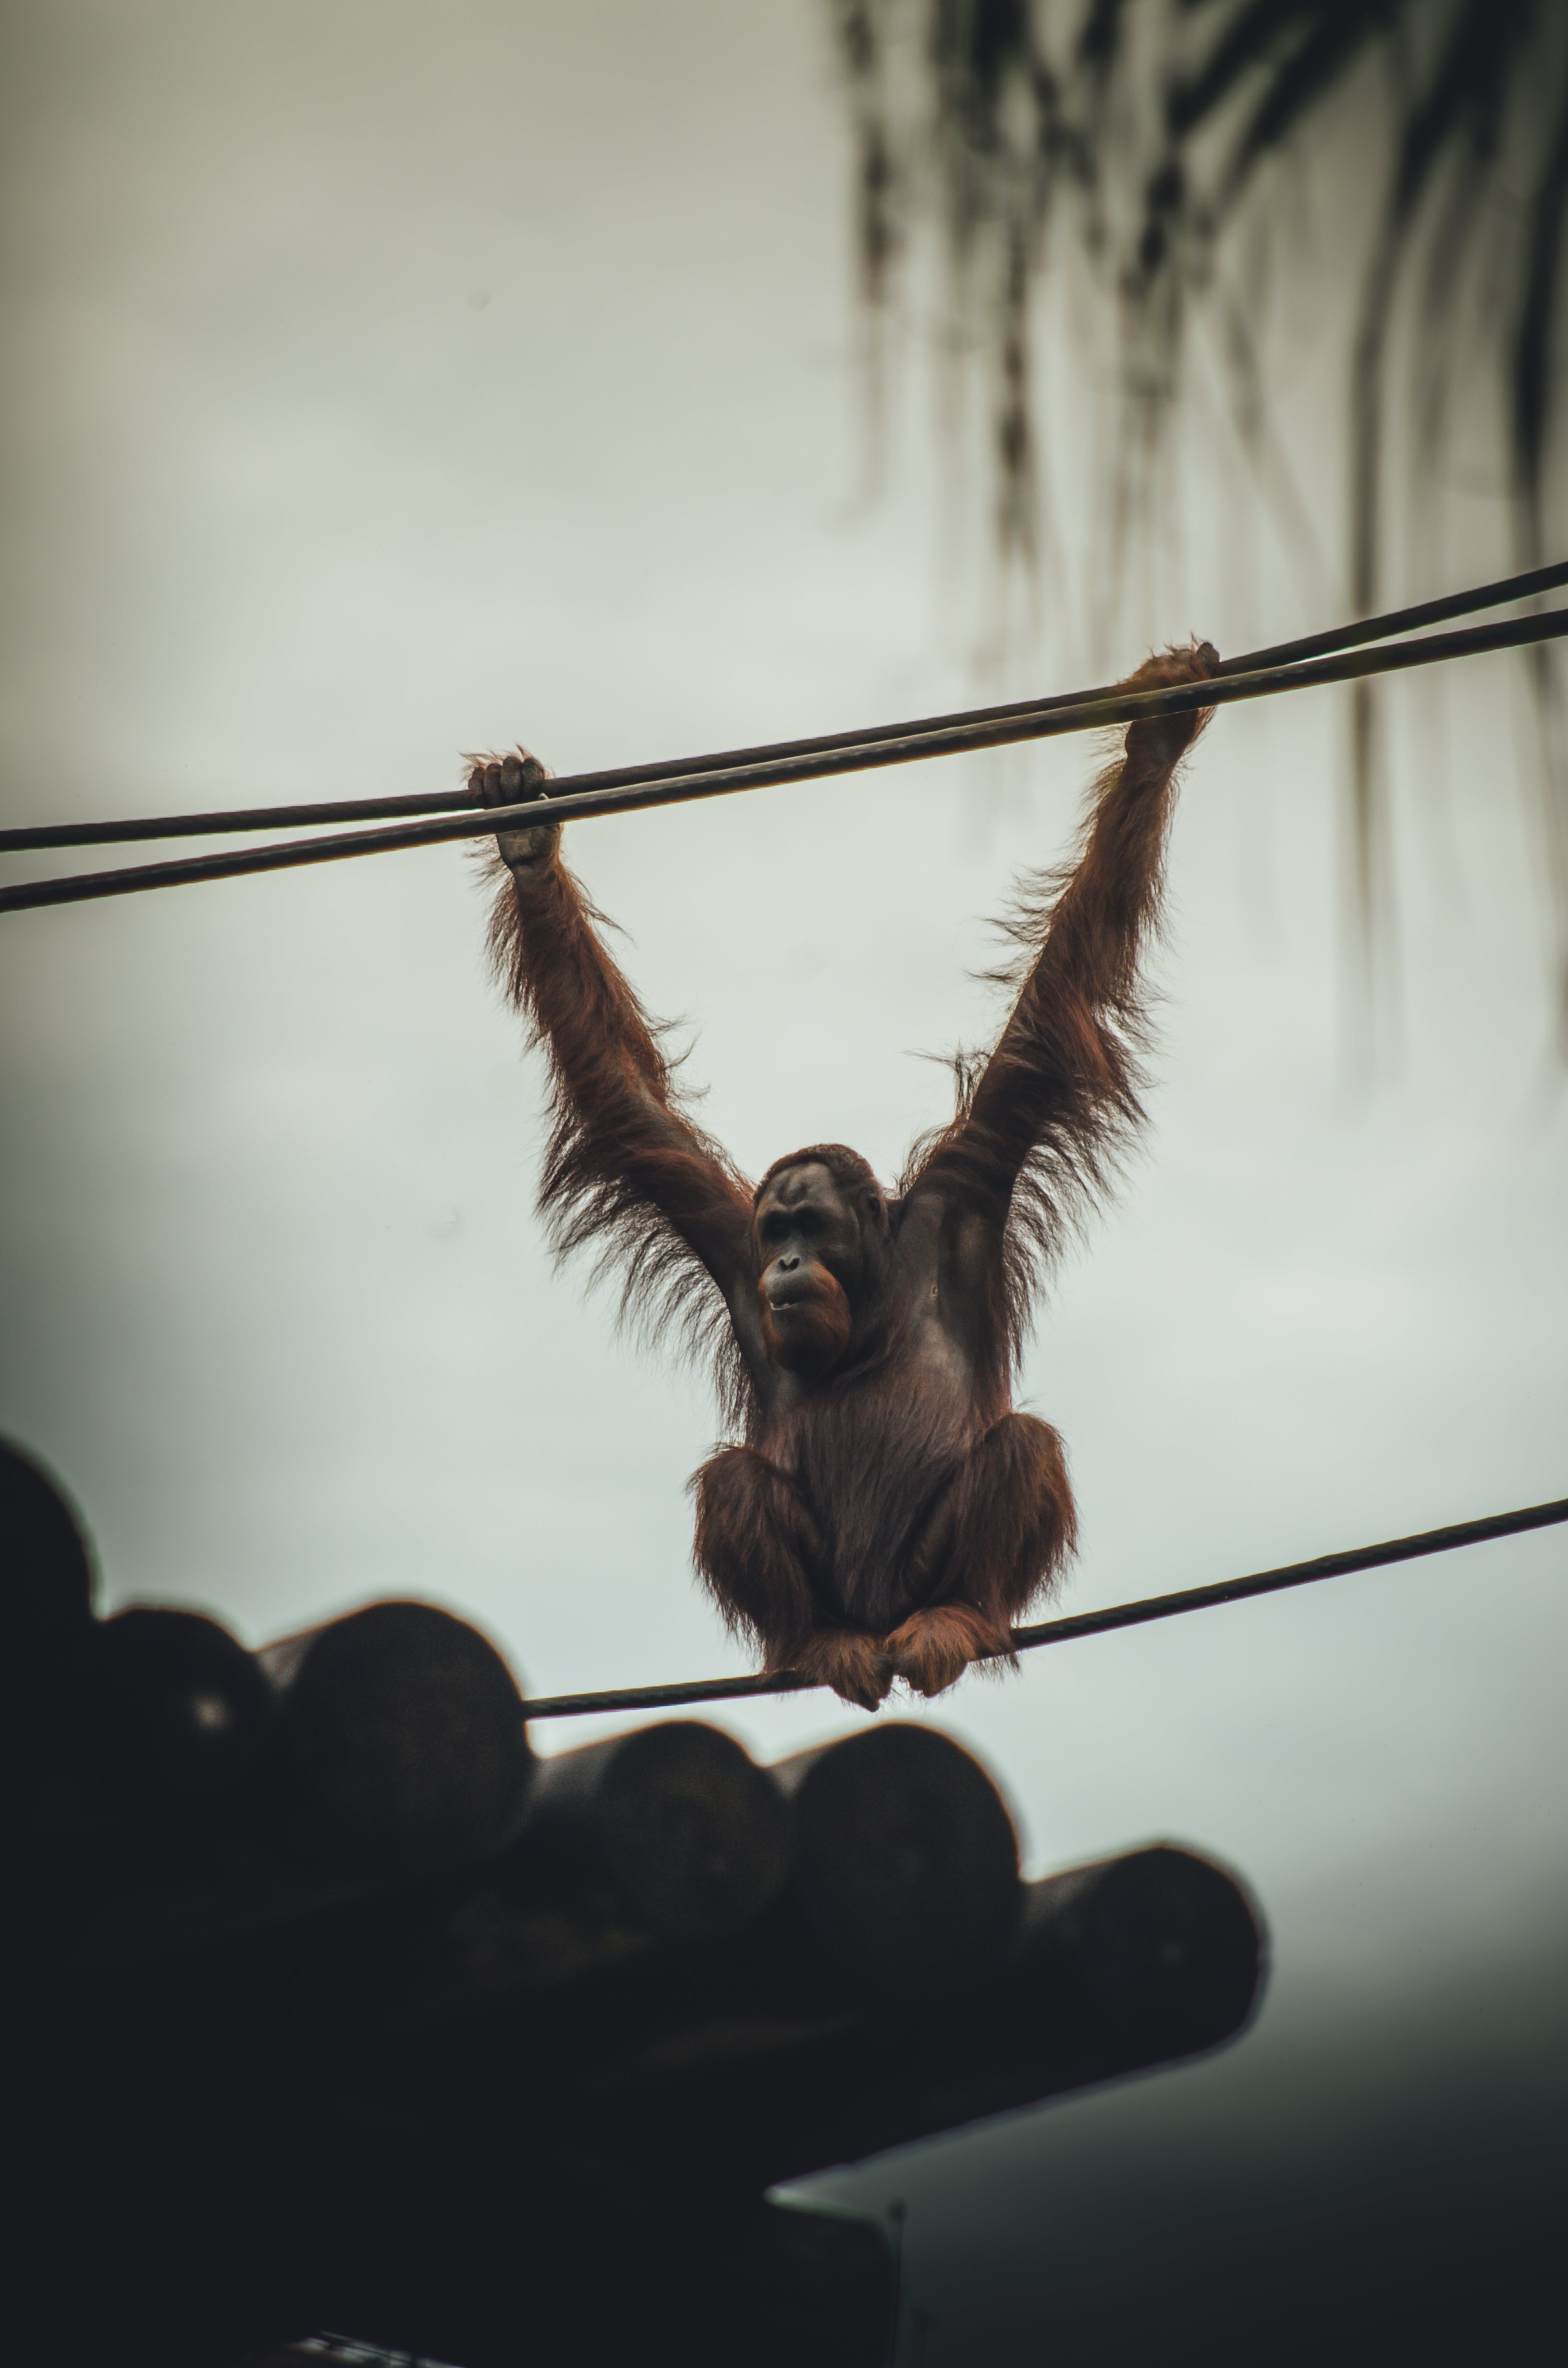 Free stock photo of animal, animals, zoo, monkey